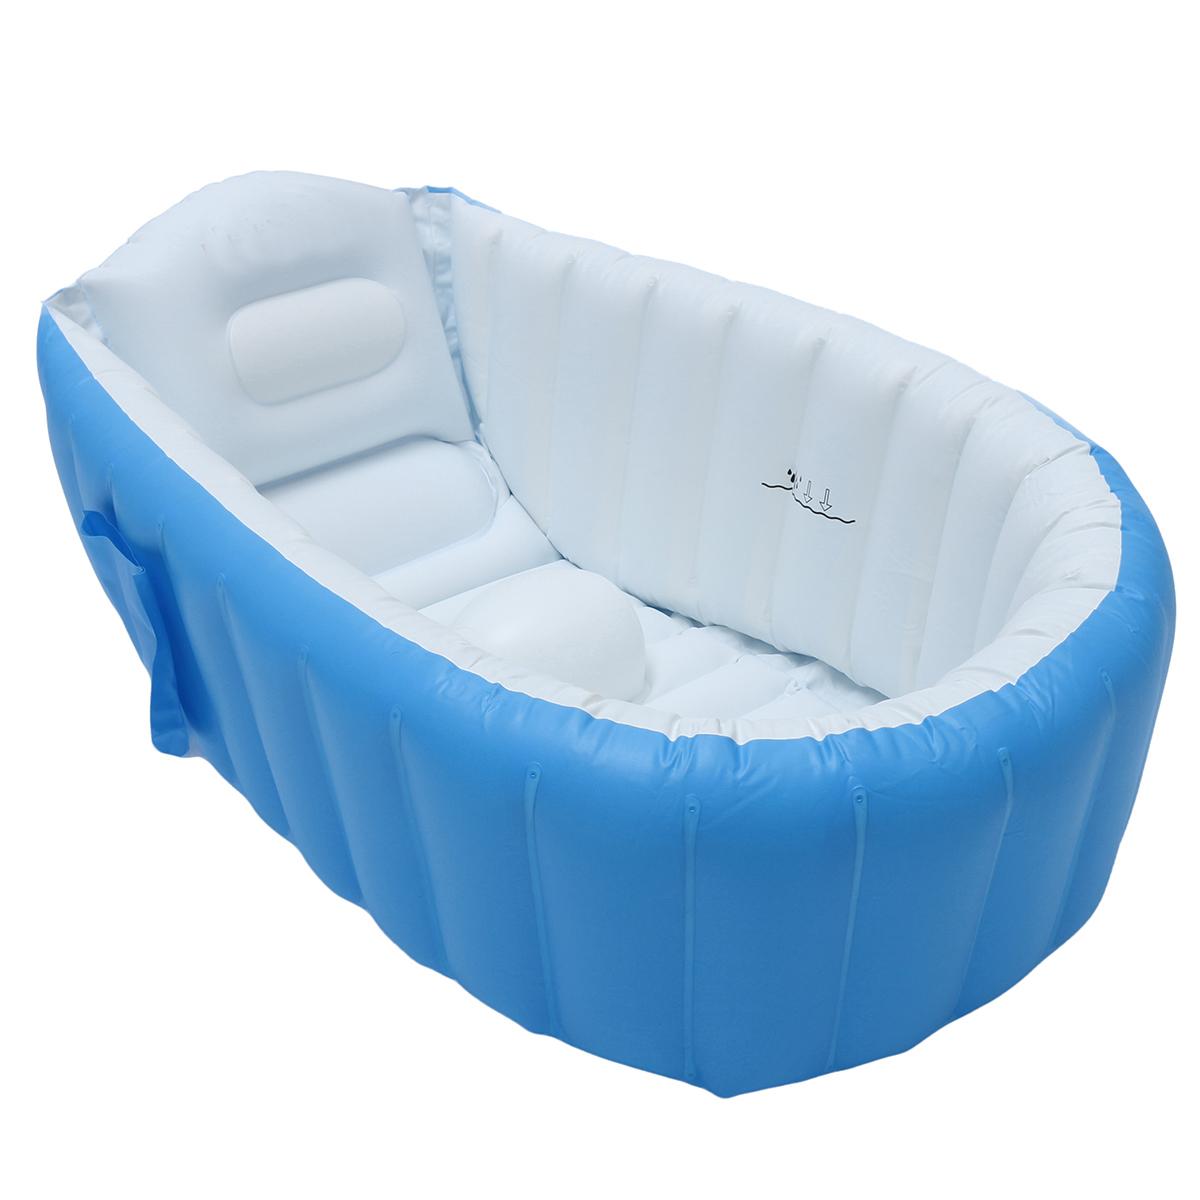 New Baby Kids Toddler Inflatable Bathtub Newborn Thick Bath Tub ...